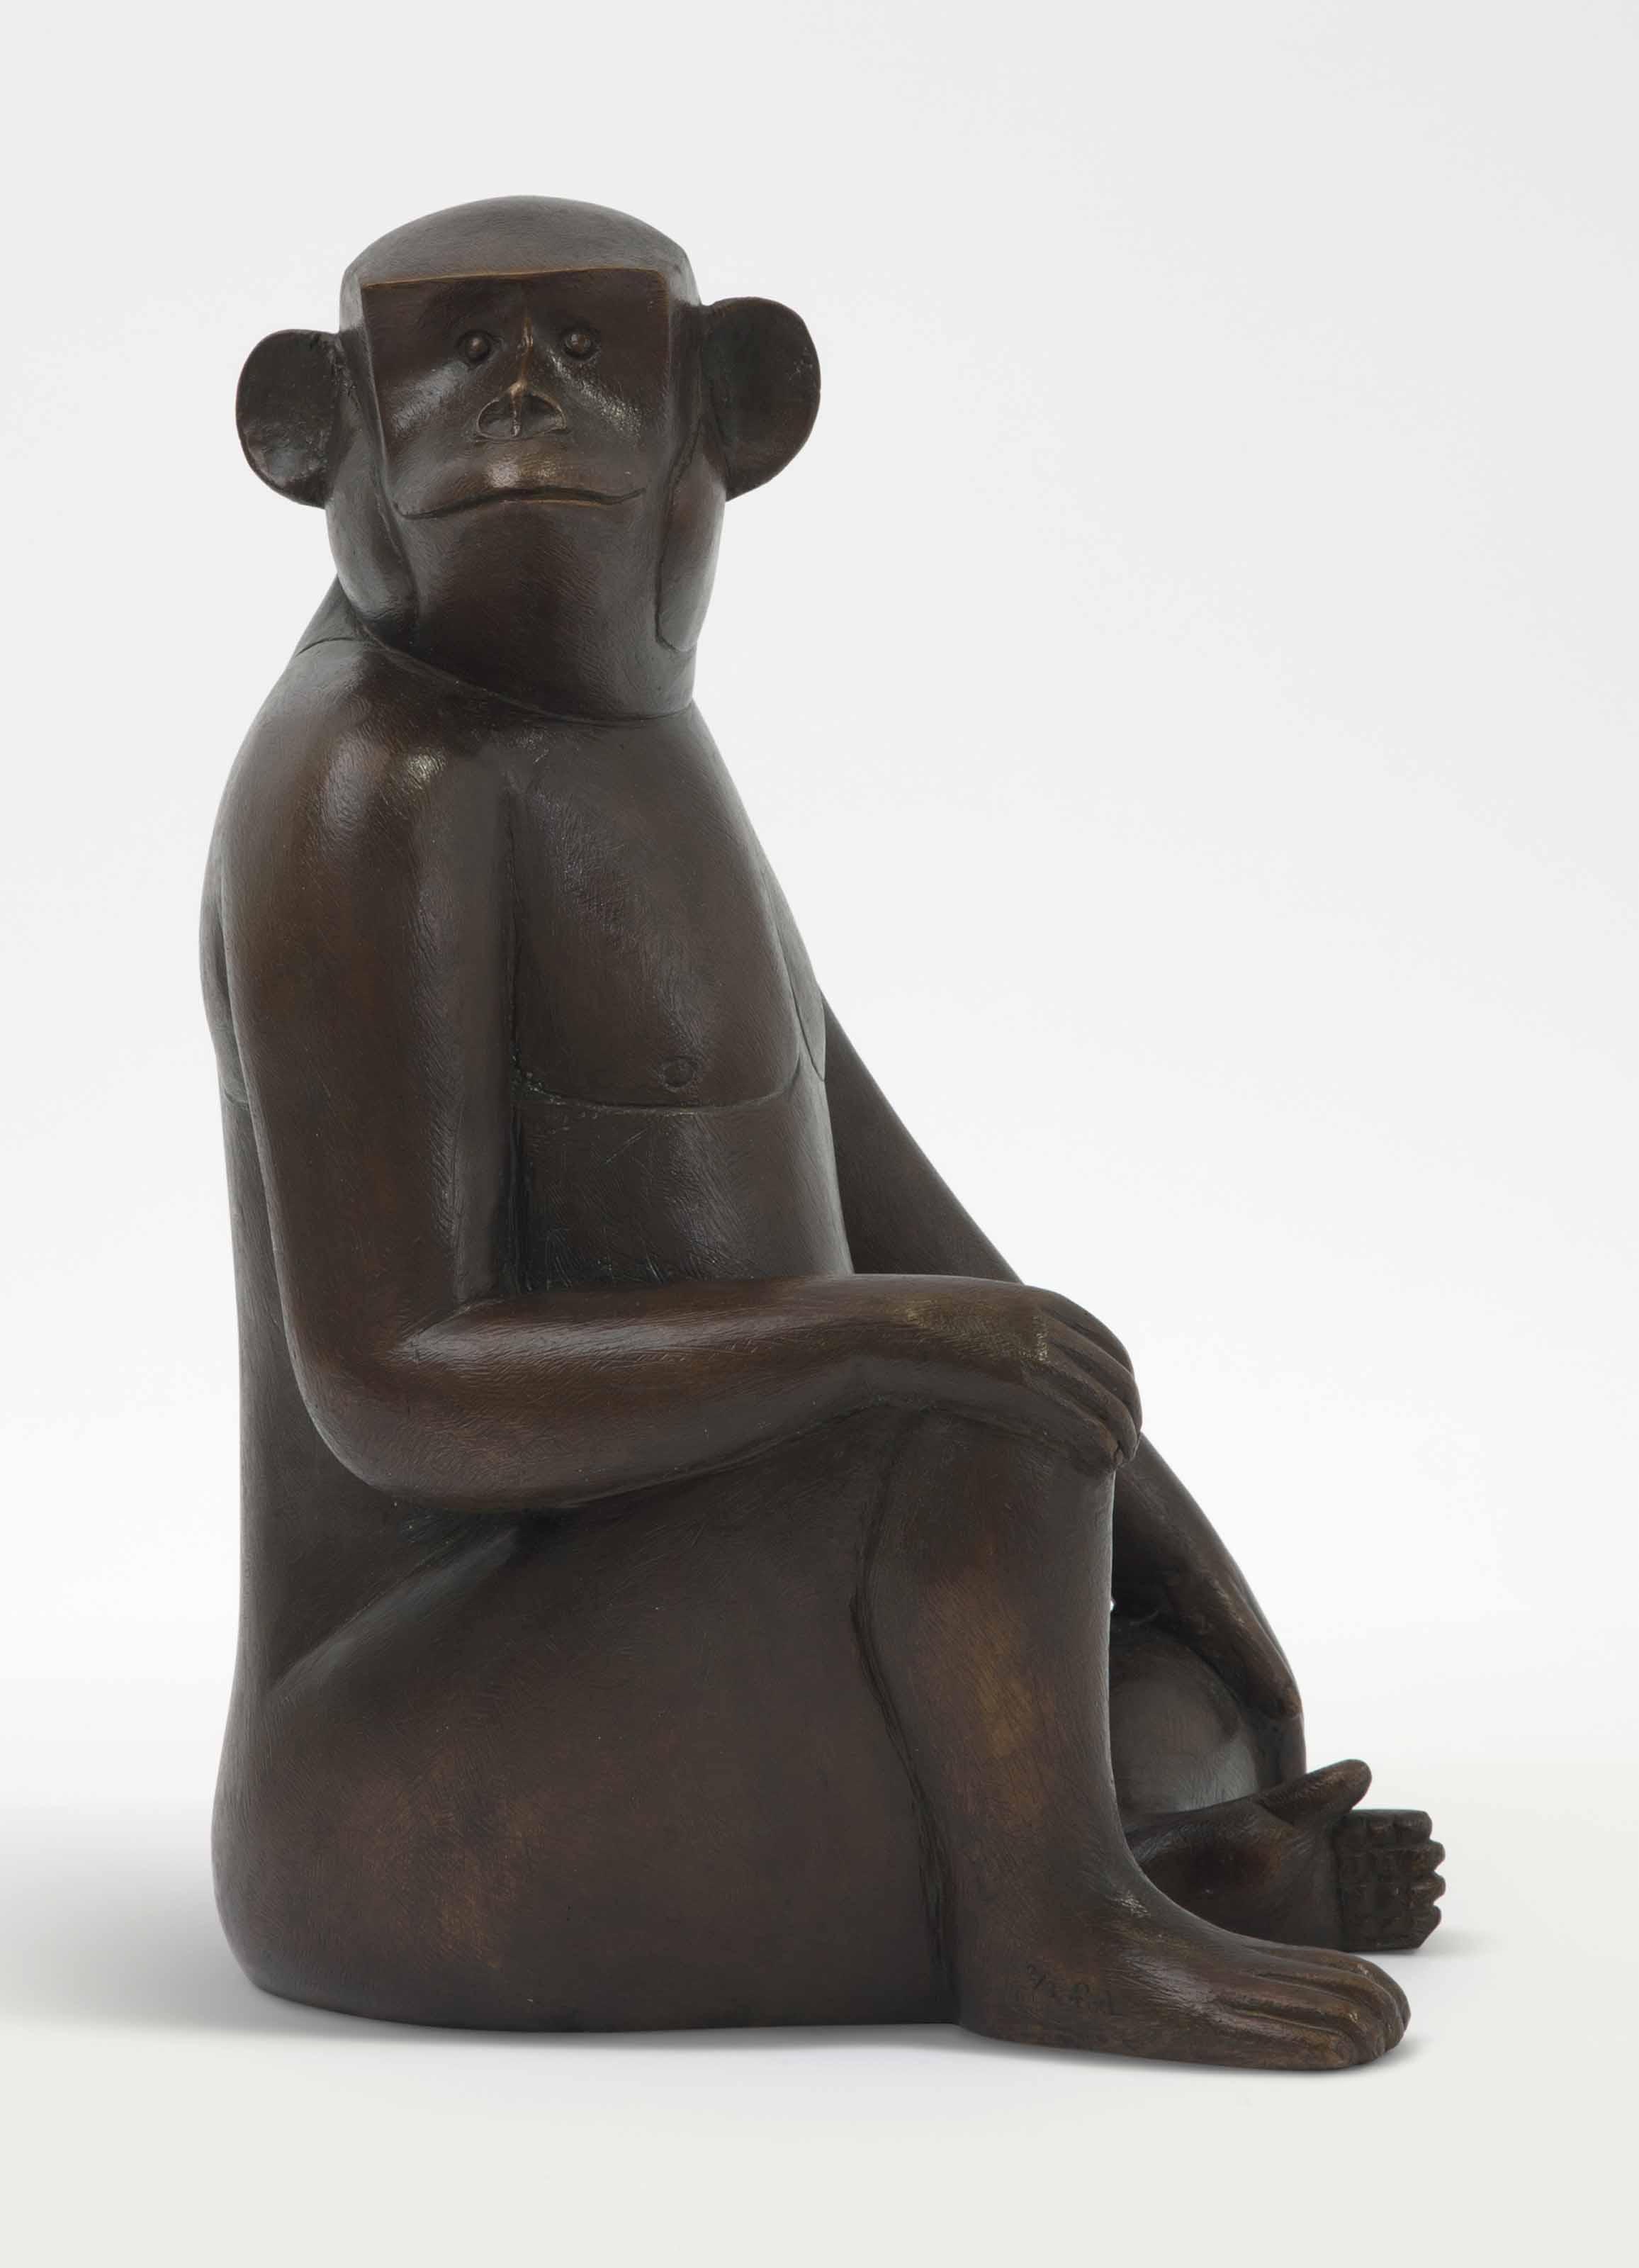 FRANCOIS-XAVIER LALANNE (1927-